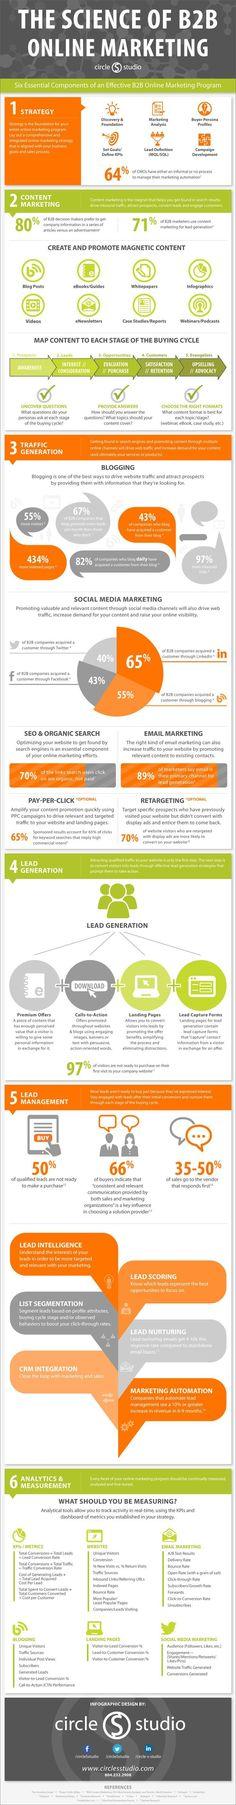 The Science of B2B Online Marketing - 6 Essential Component Of An Effective B2B Online Marketing Plan http://ift.tt/pRFFOU Infographic